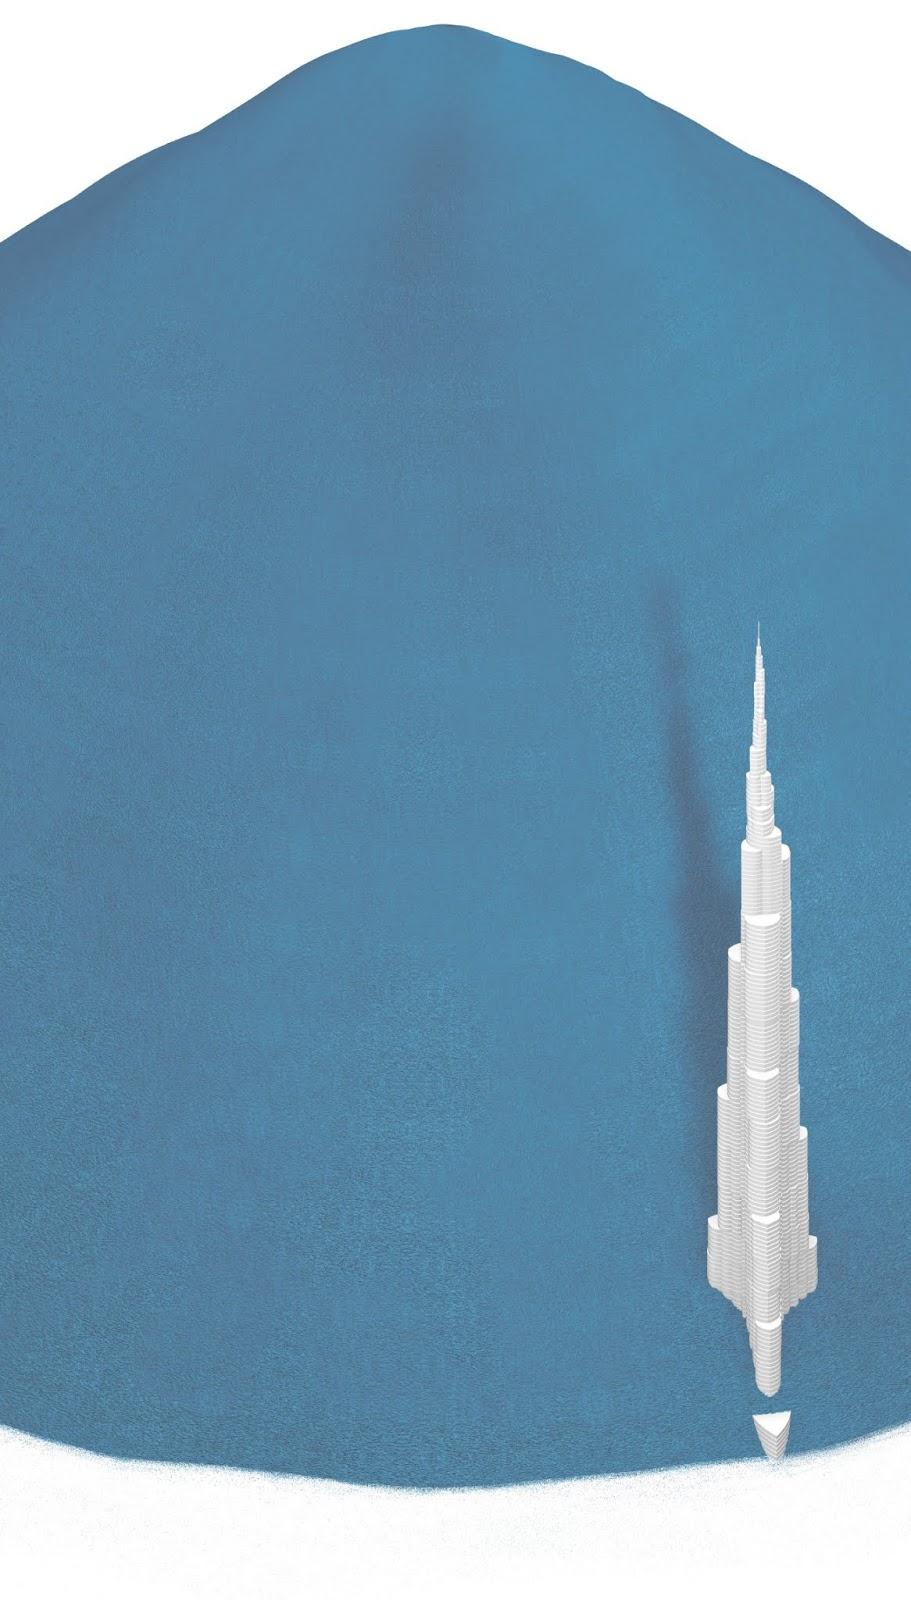 Plastic bottles and Burj Khalifa